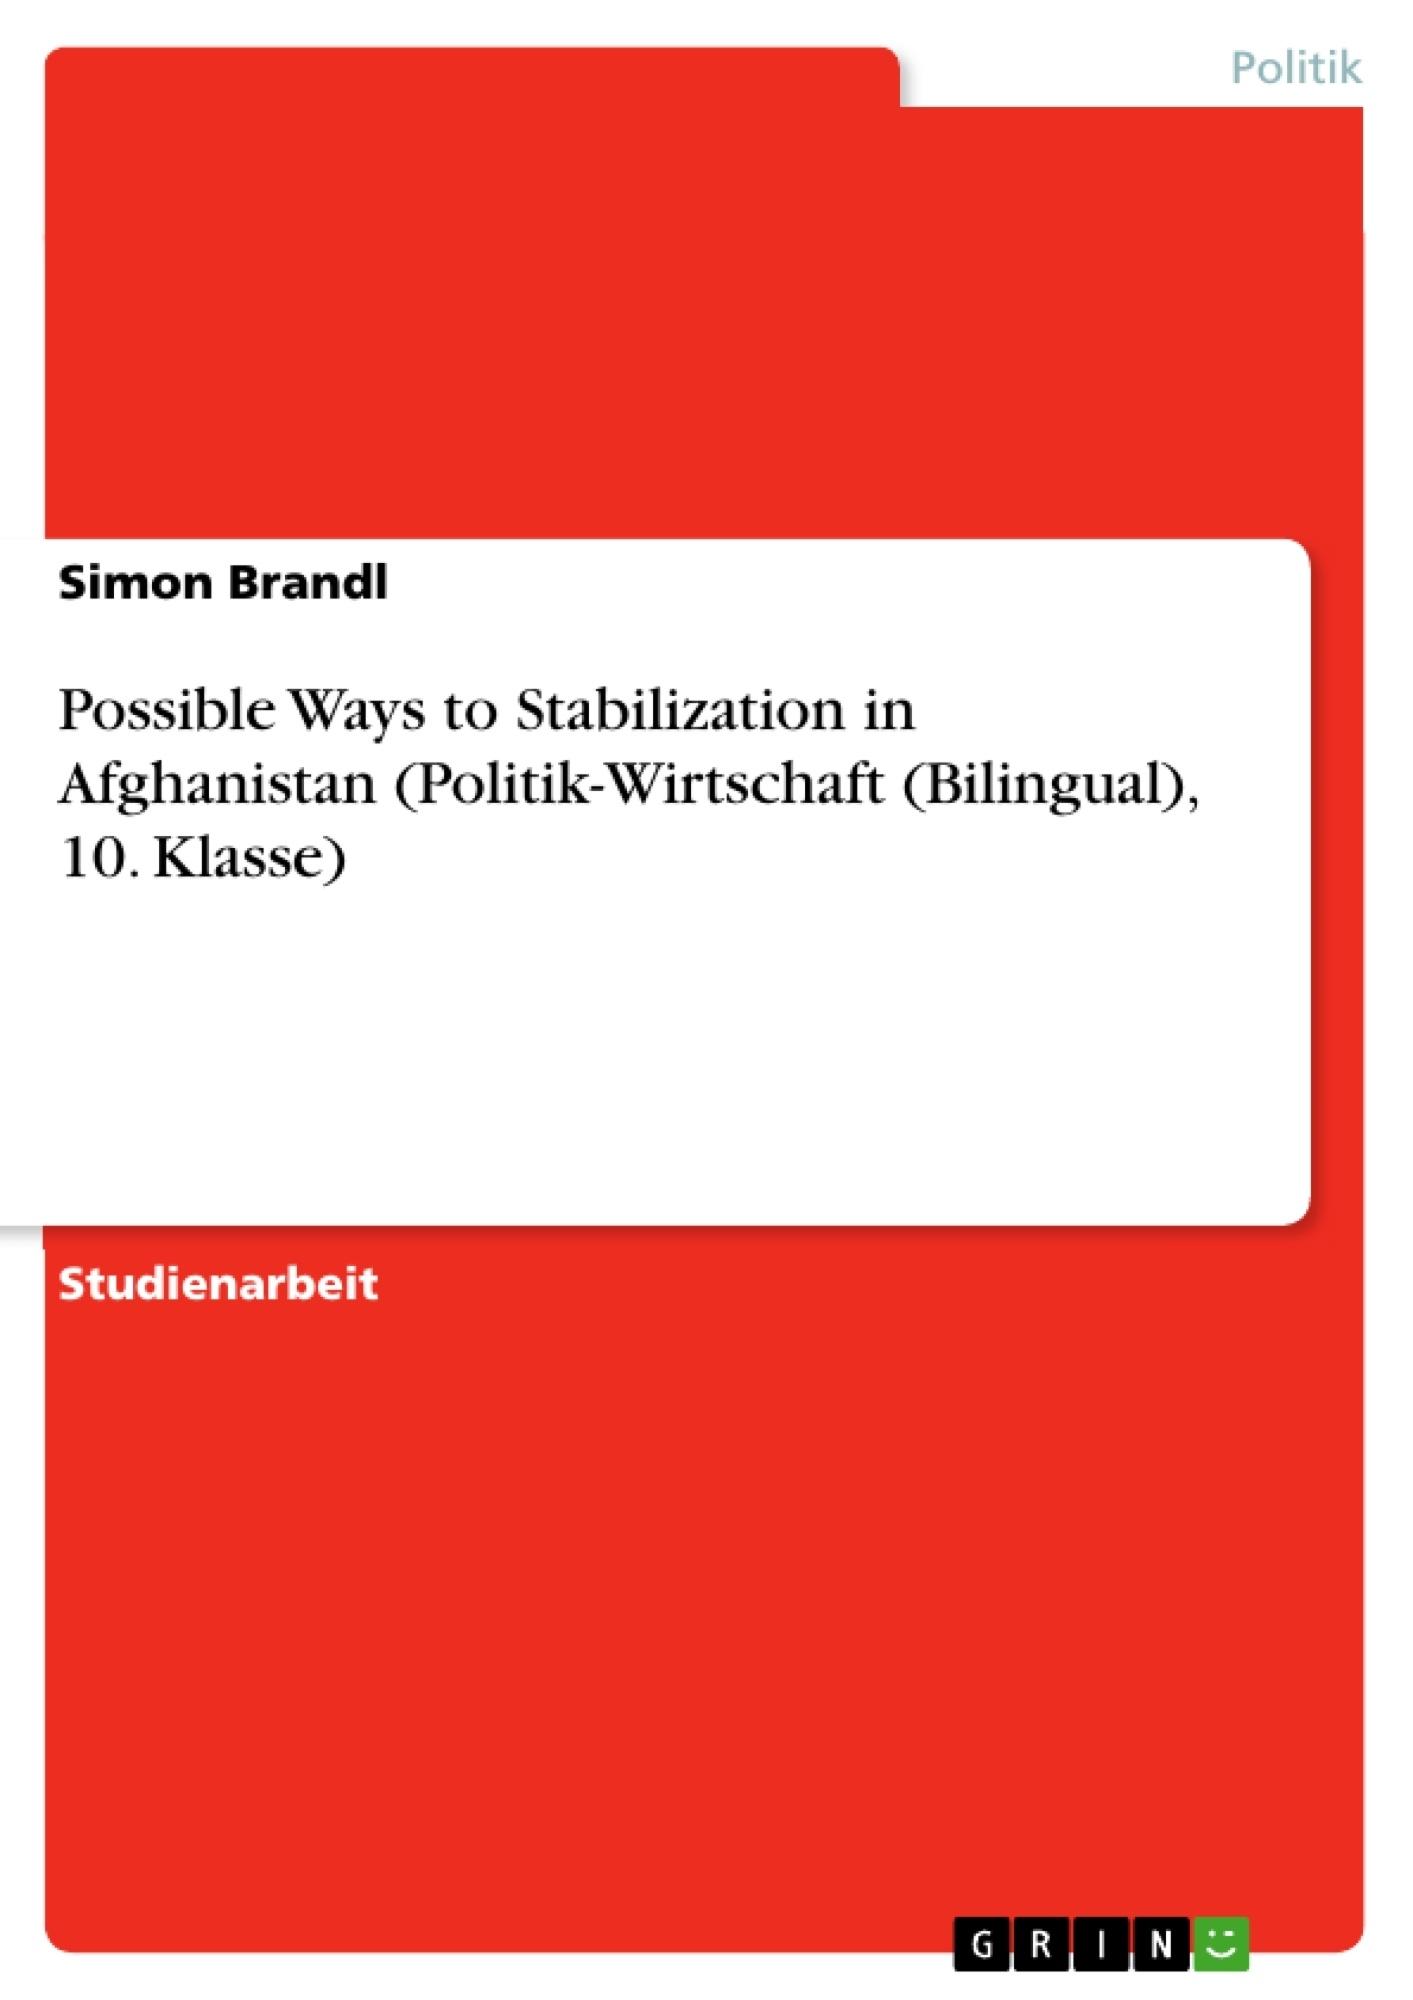 Titel: Possible Ways to Stabilization in Afghanistan (Politik-Wirtschaft (Bilingual), 10. Klasse)